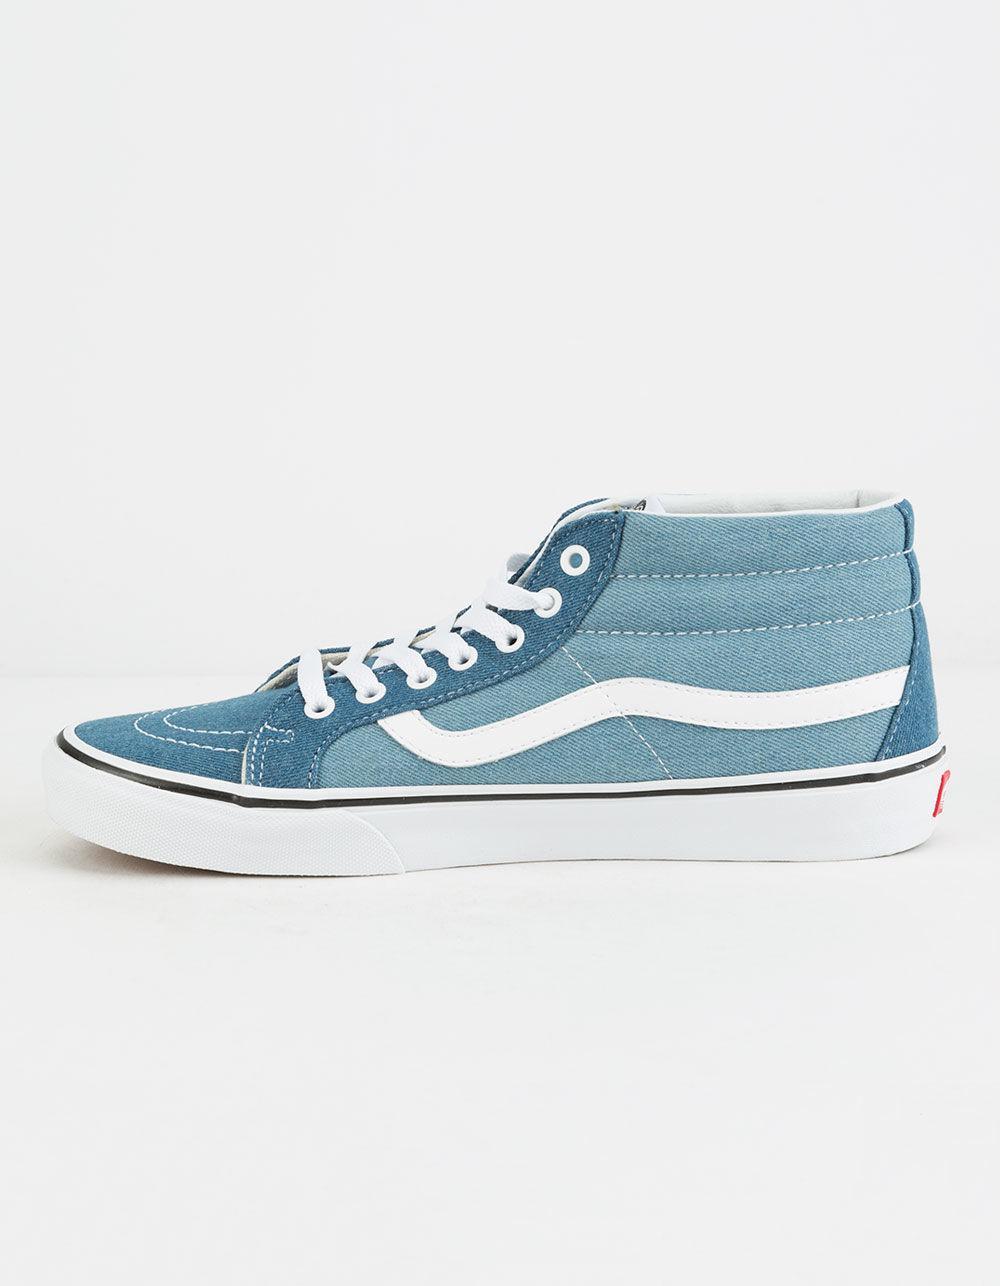 8f59efa7f5ae51 Lyst - Vans Denim 2-tone Sk8-mid Reissue Shoes in Blue for Men